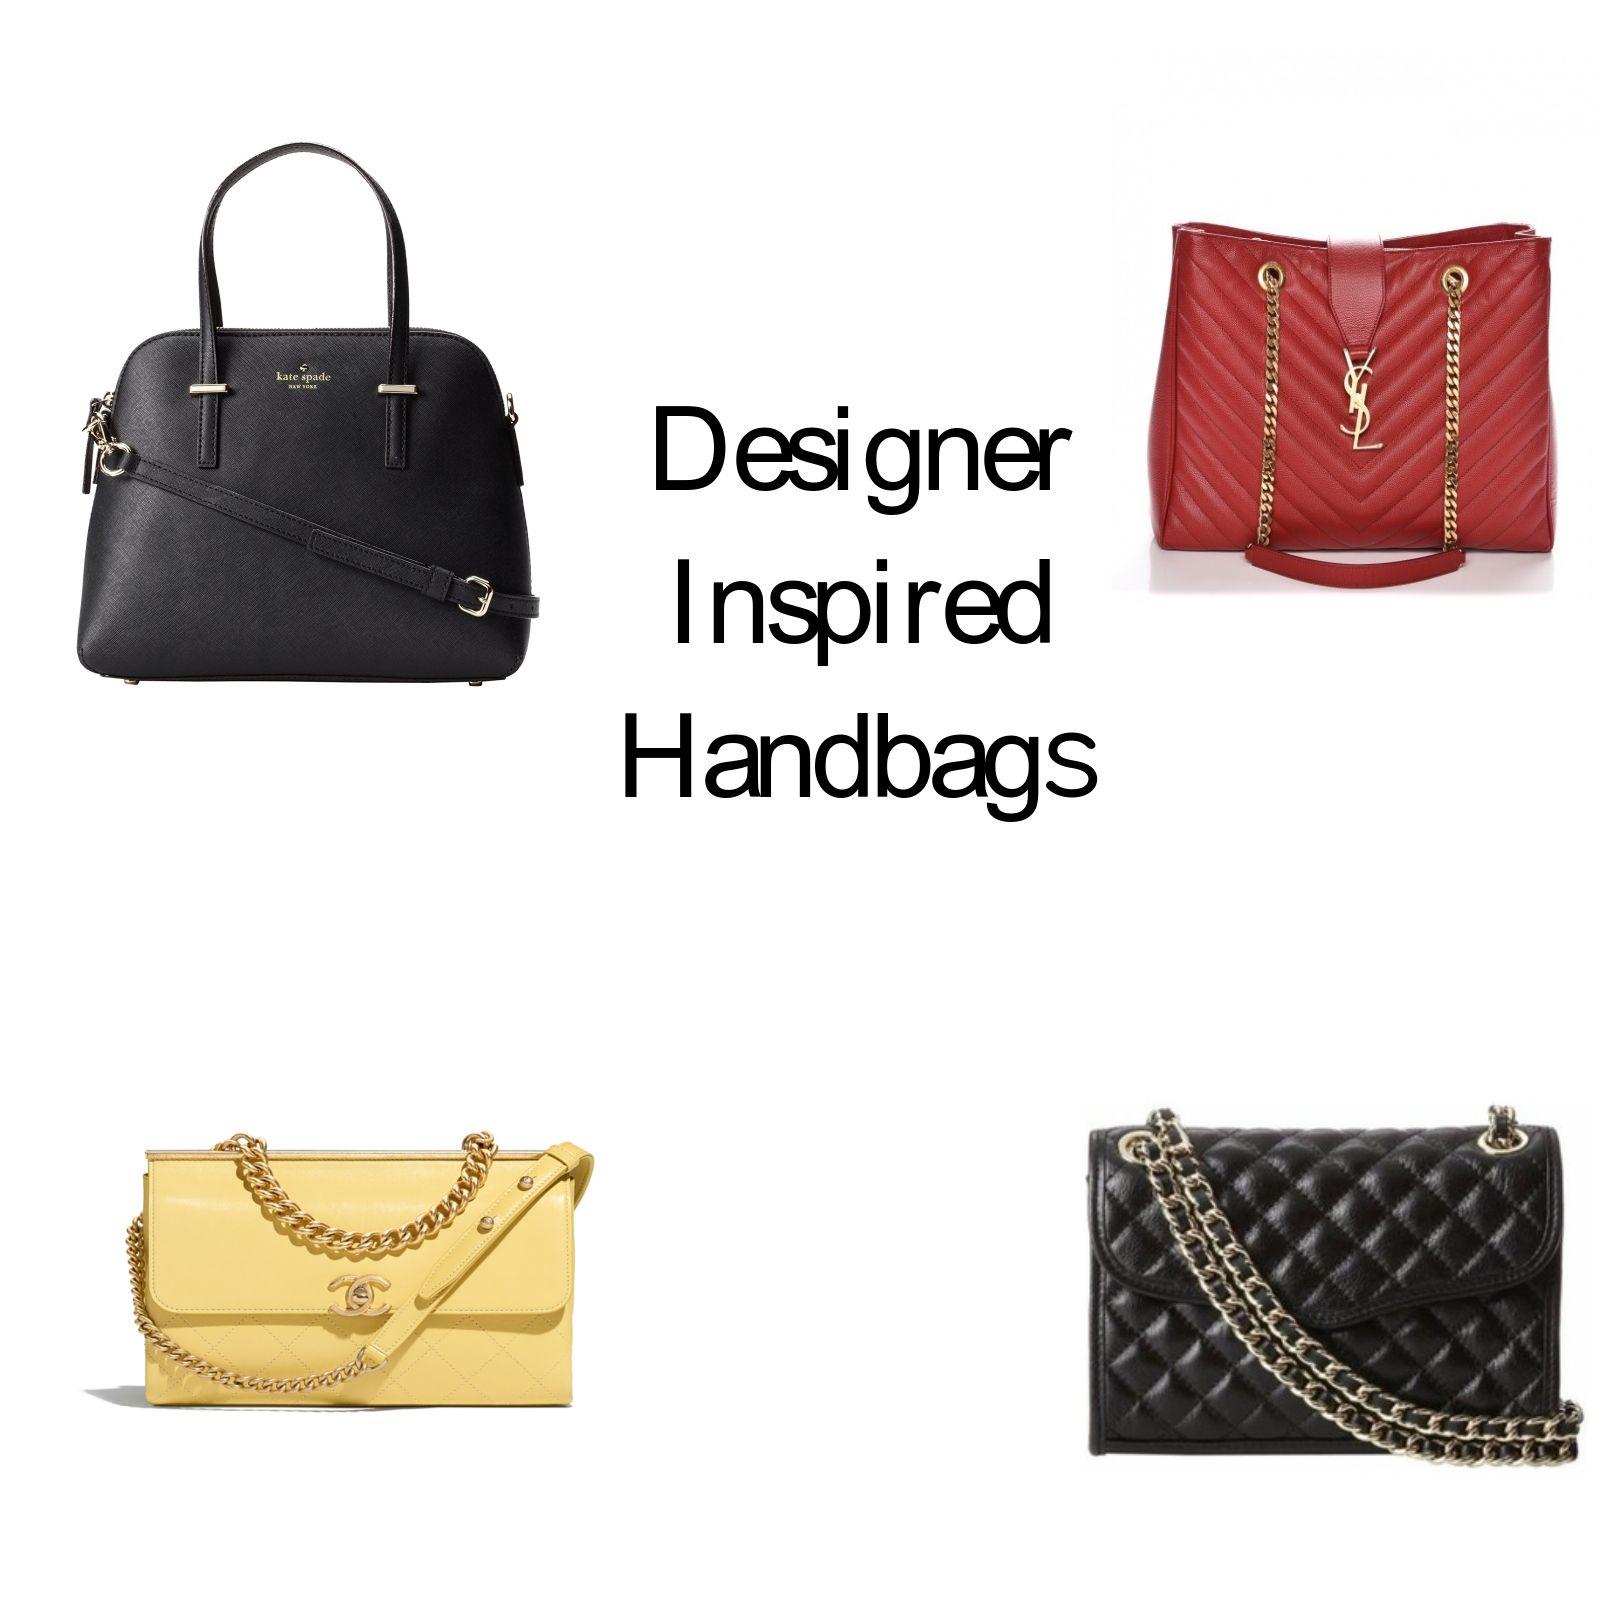 Designer Inspired Handbags Whole Uk Bags Online Leather Chanel